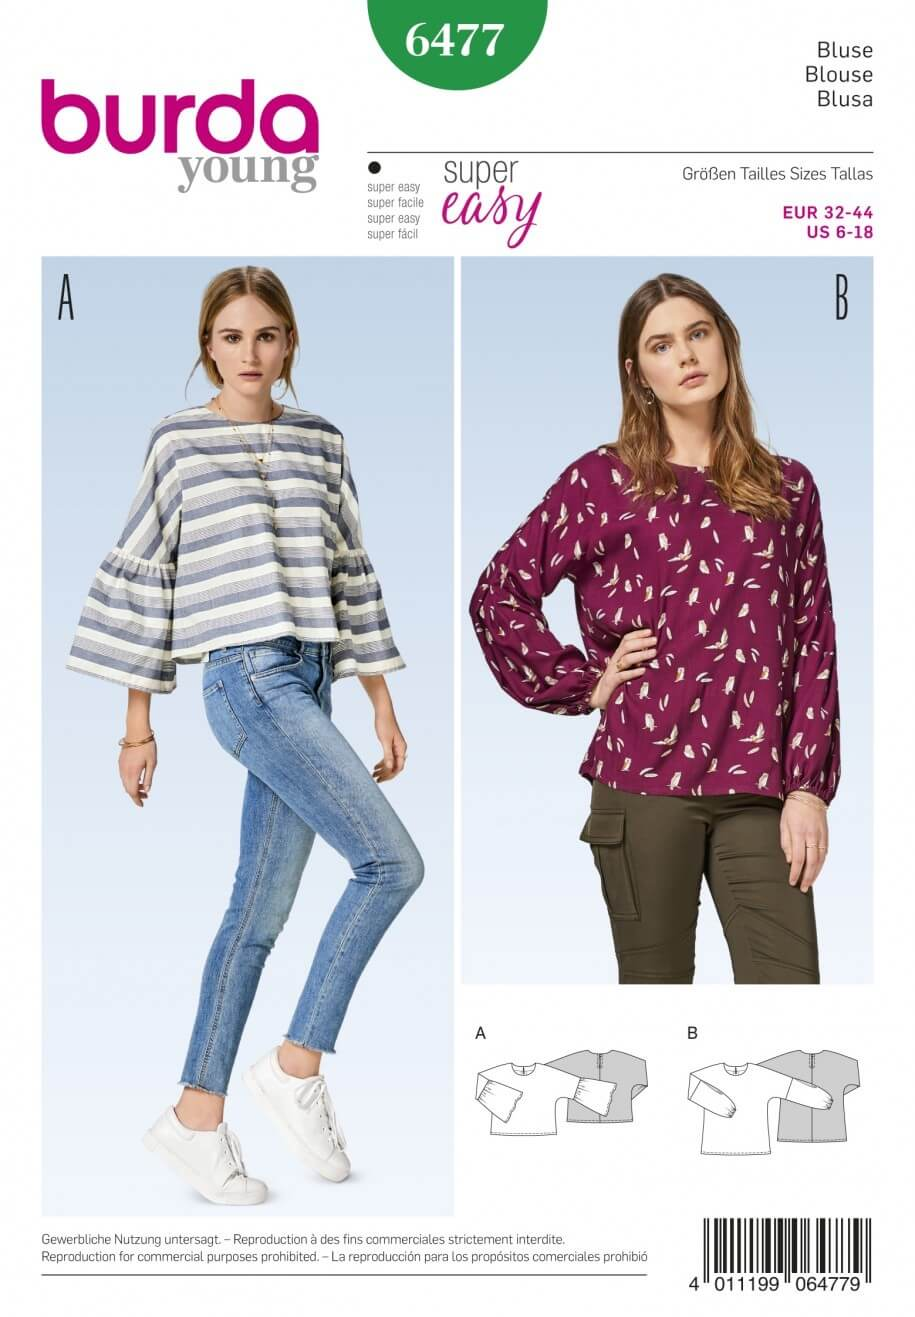 Burda Style Women's Long Sleeve Loose Fit Top Dress Sewing Pattern 6477